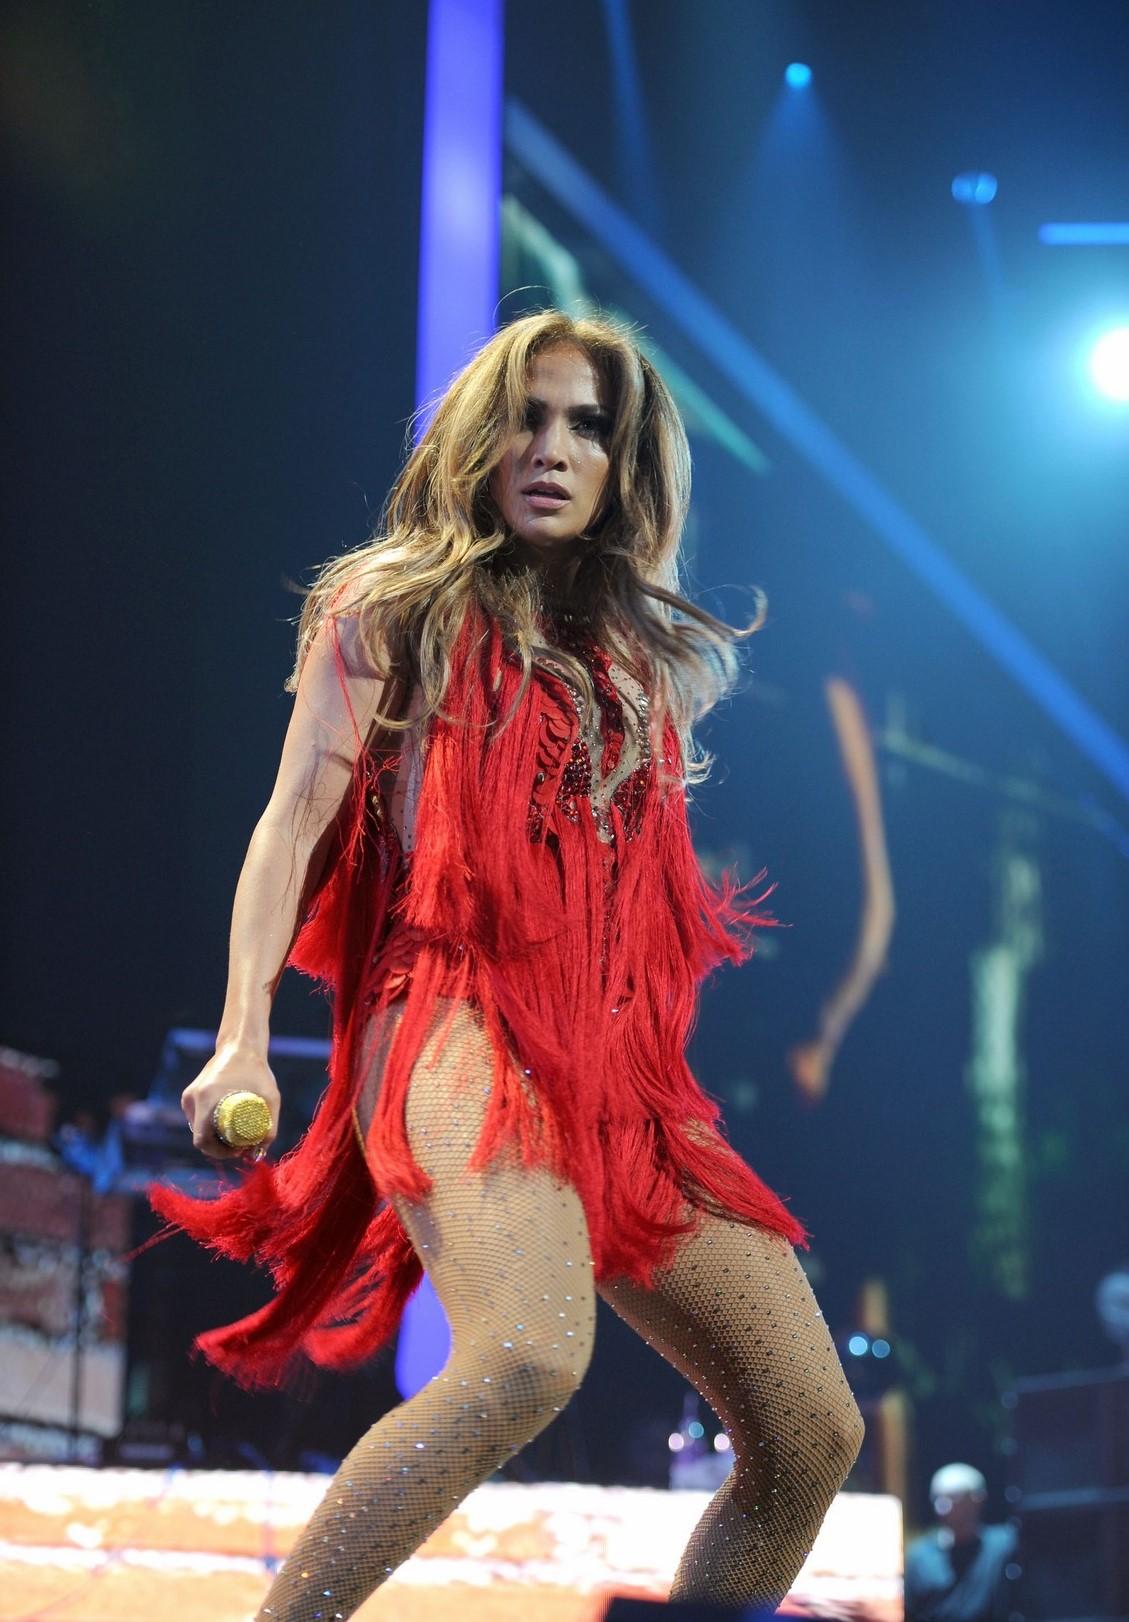 Jennifer Lopez photo 2653 of 7116 pics, wallpaper - photo ...